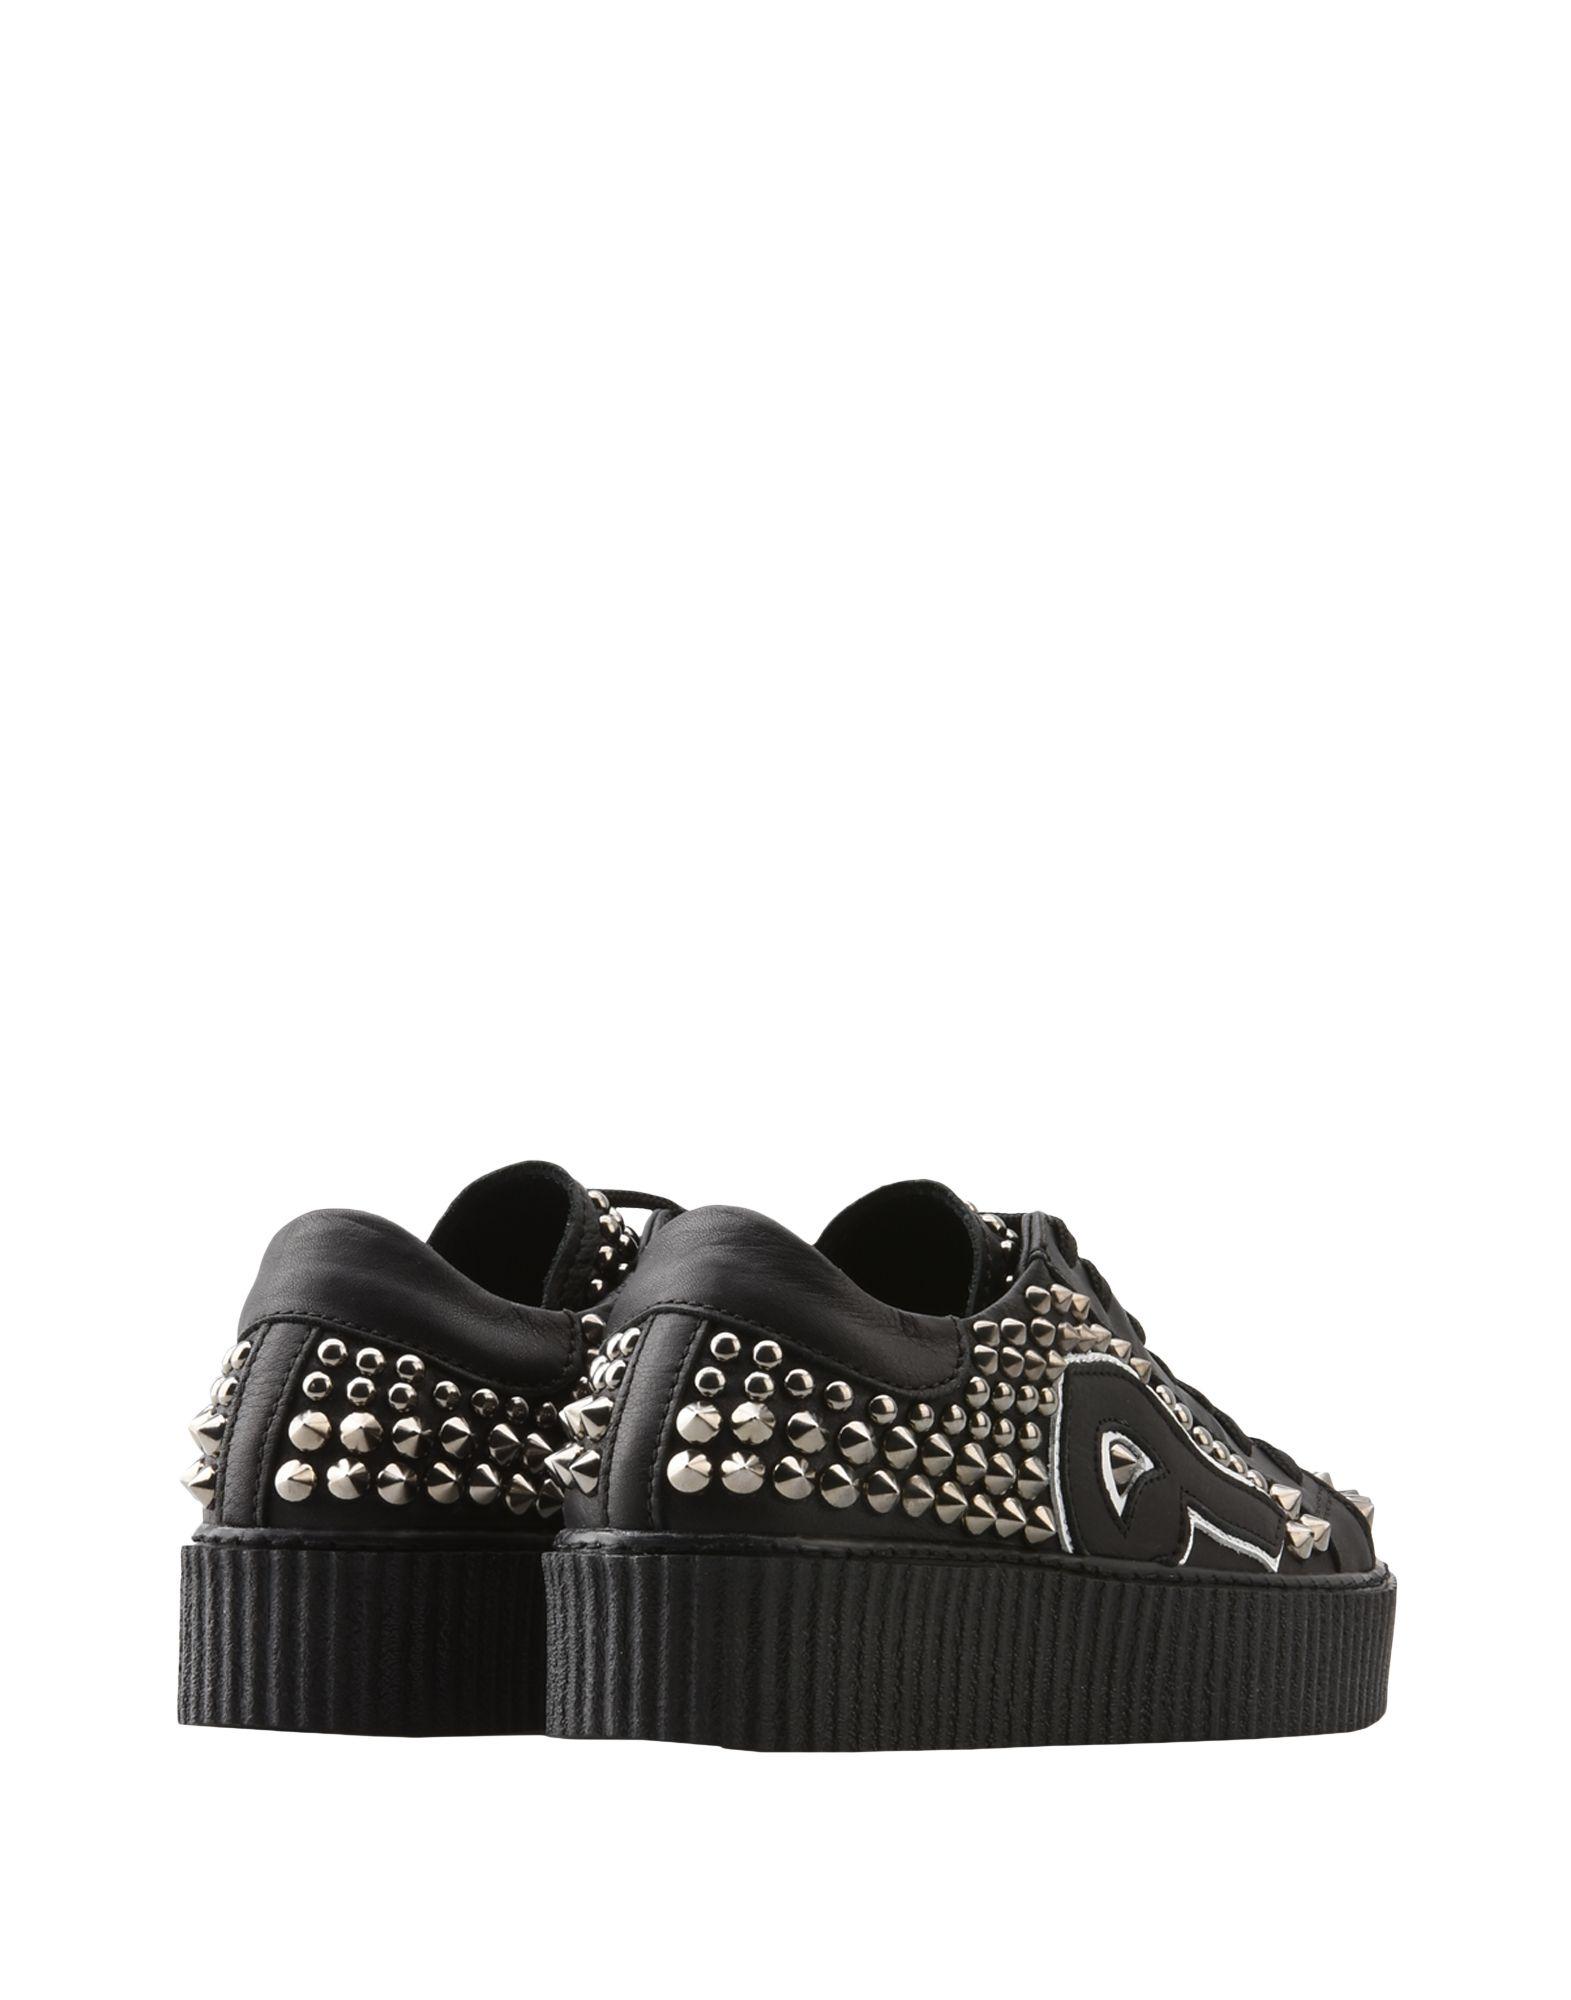 Absinthe Culture Bl28 aussehende Black+Cannadi Fucile  11195429ODGut aussehende Bl28 strapazierfähige Schuhe 501100